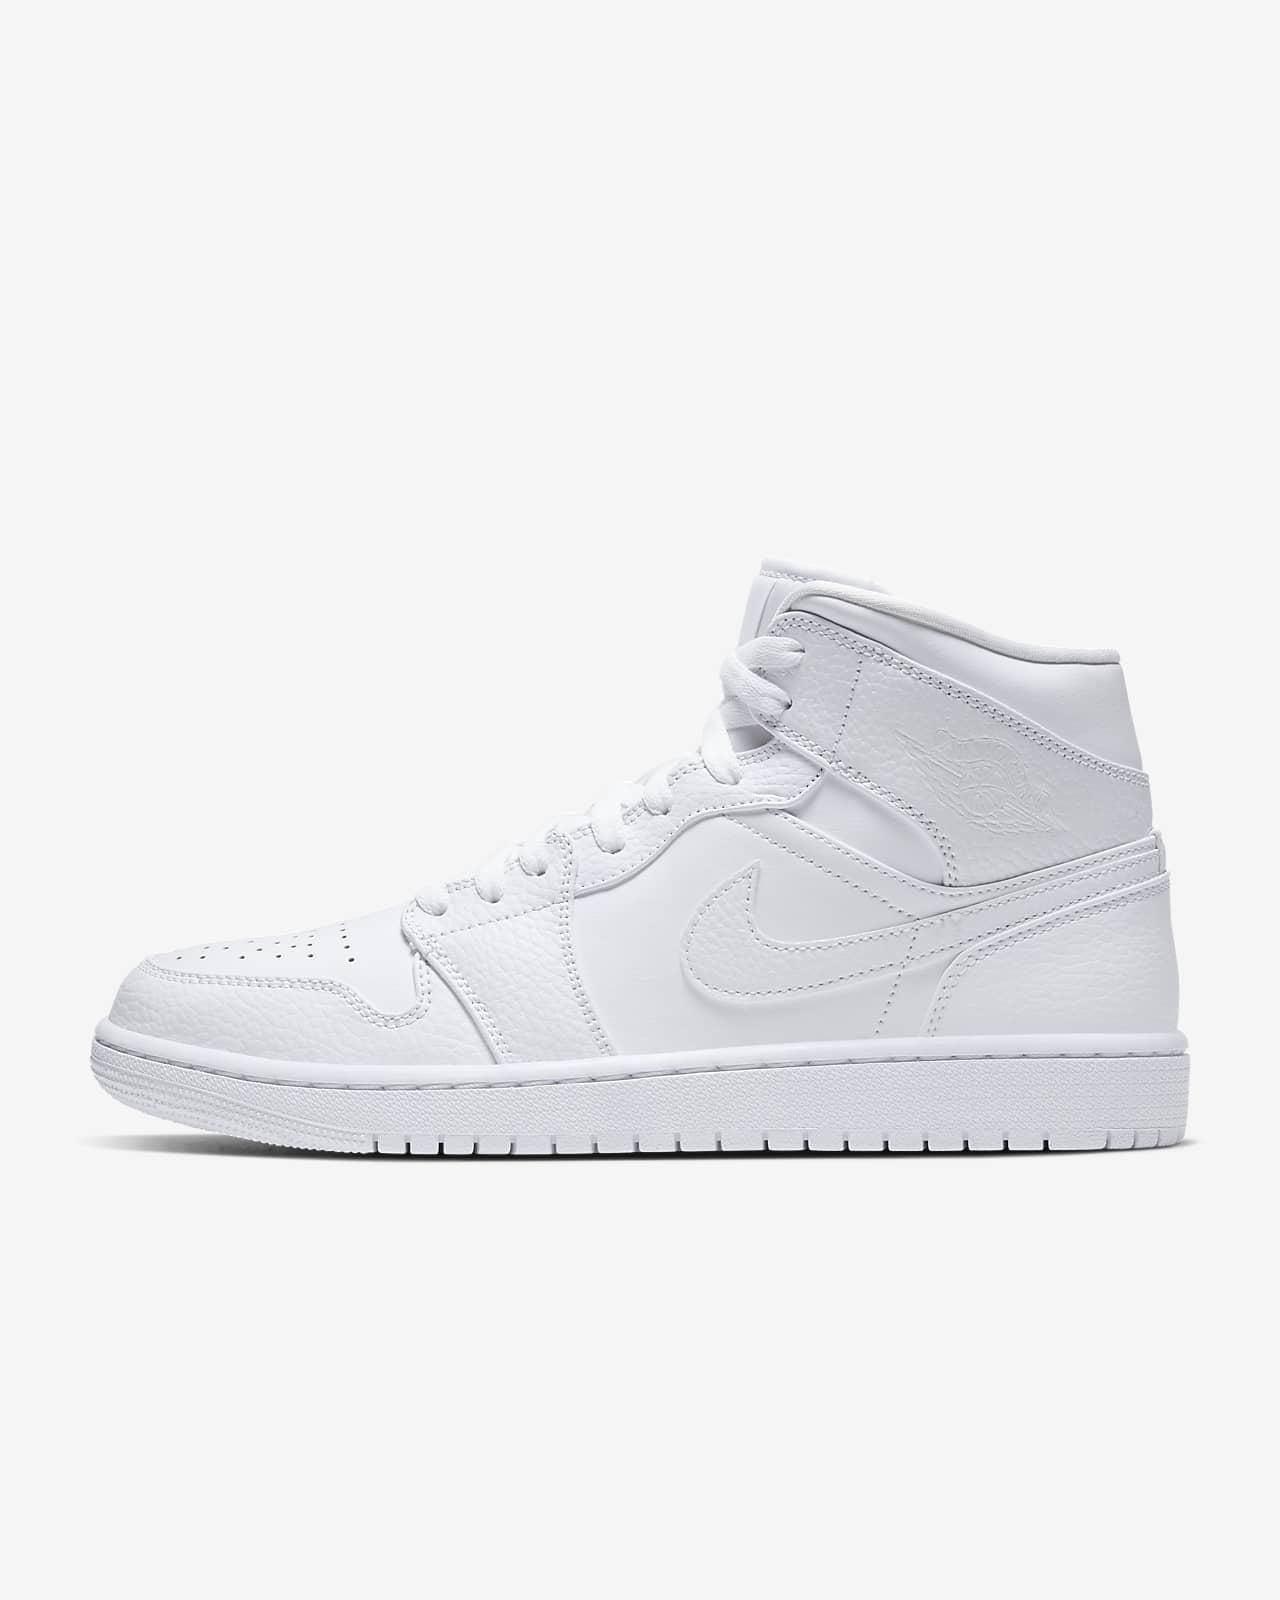 Air Jordan 1 Mid Schoen